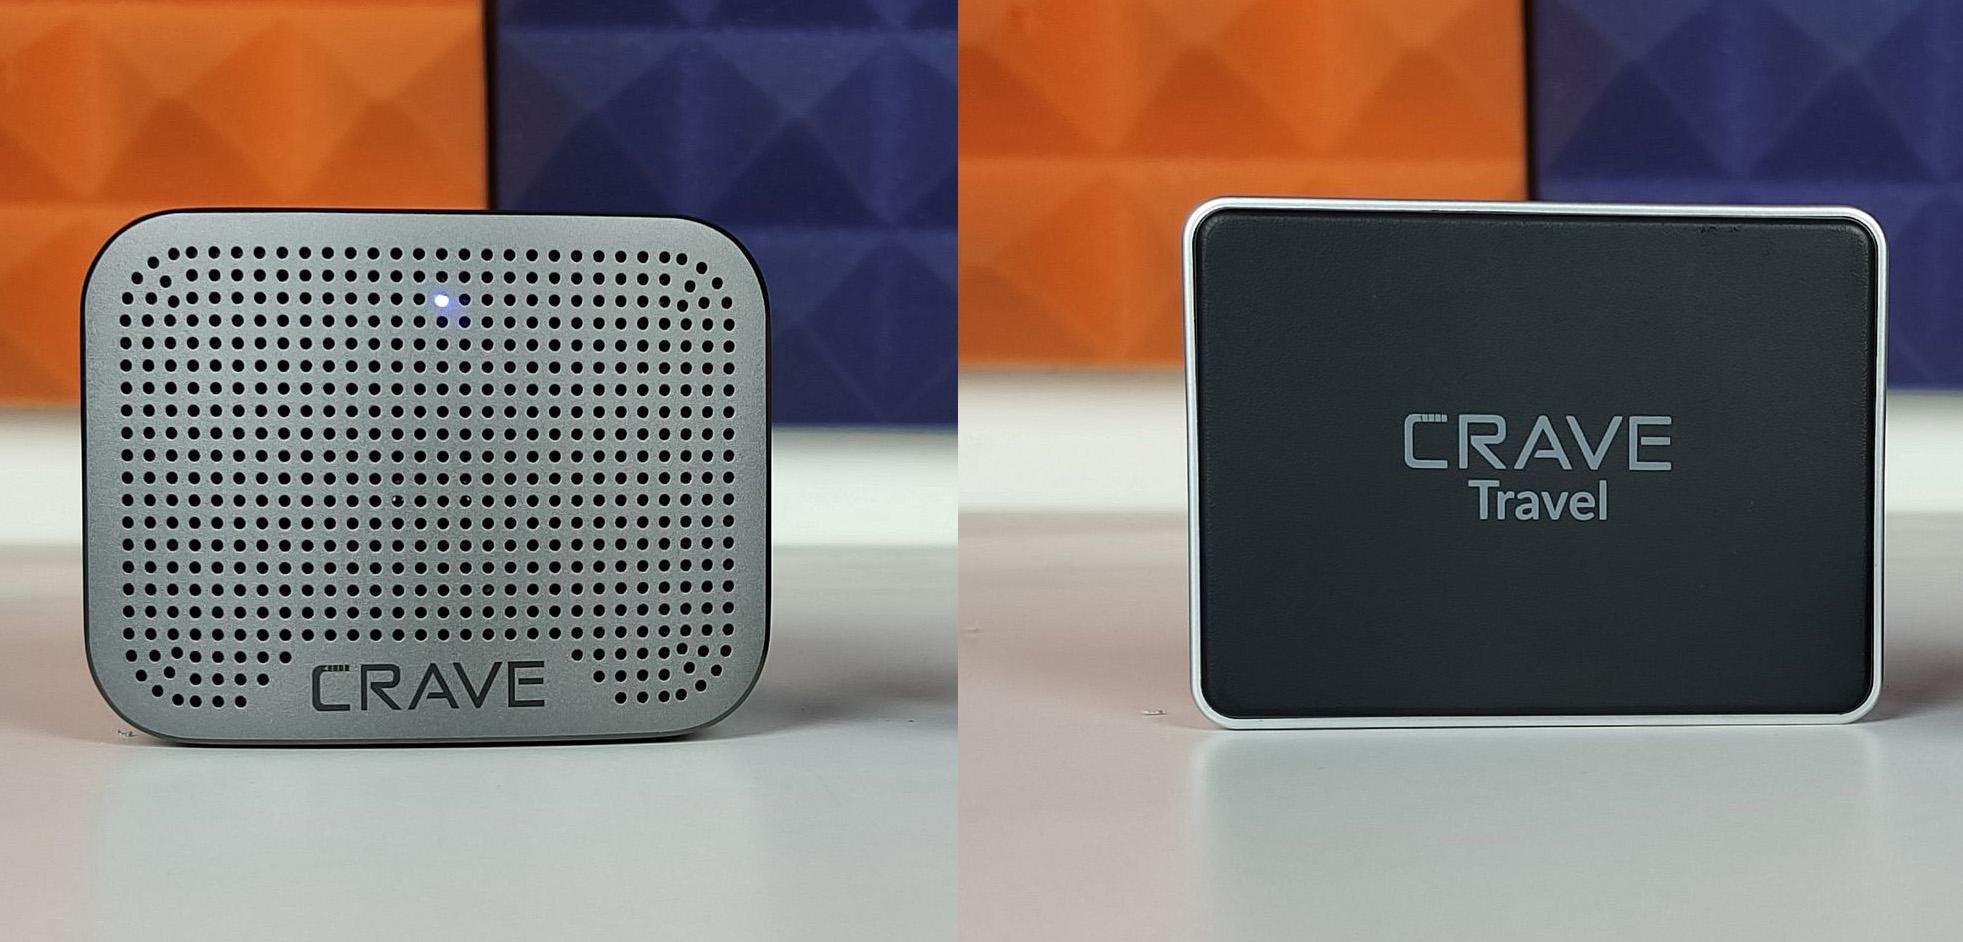 Crave Curve Mini Bluetooth speaker amp Crave Travel Power bank Review 2 1